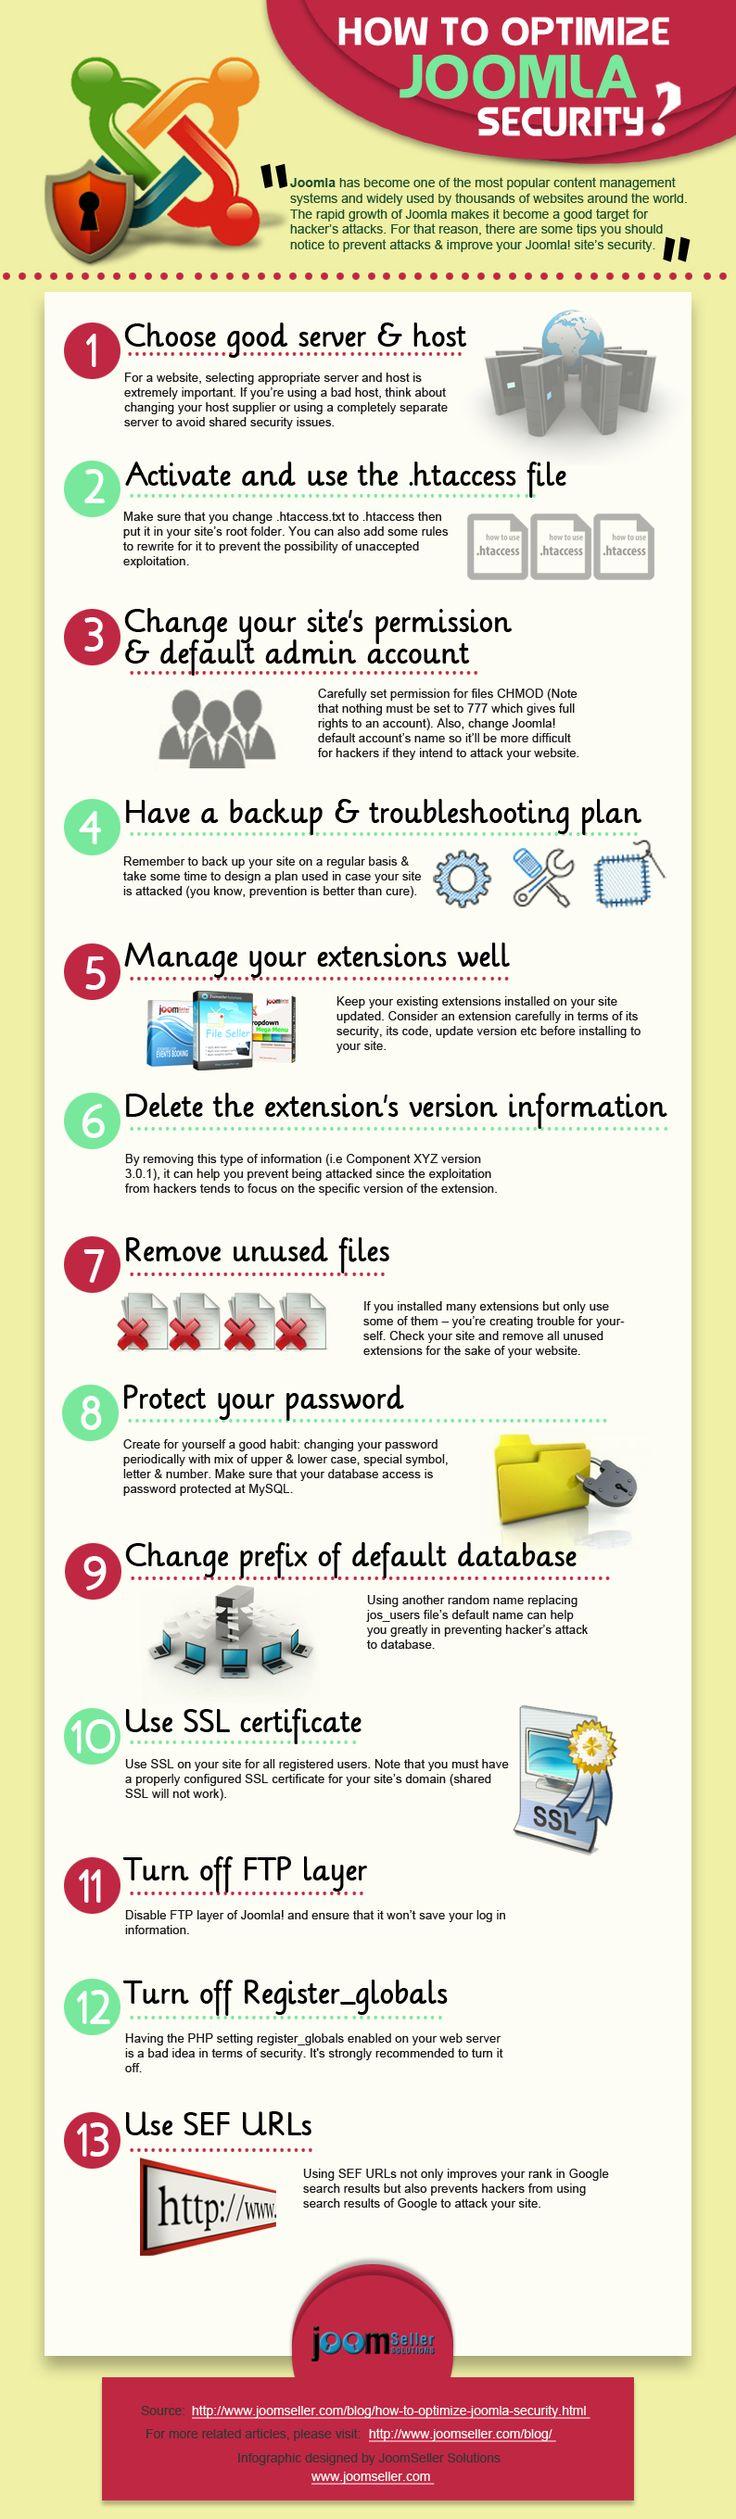 Joomla tshirt design - How To Optimize Joomla Security Infographic Joomla Security